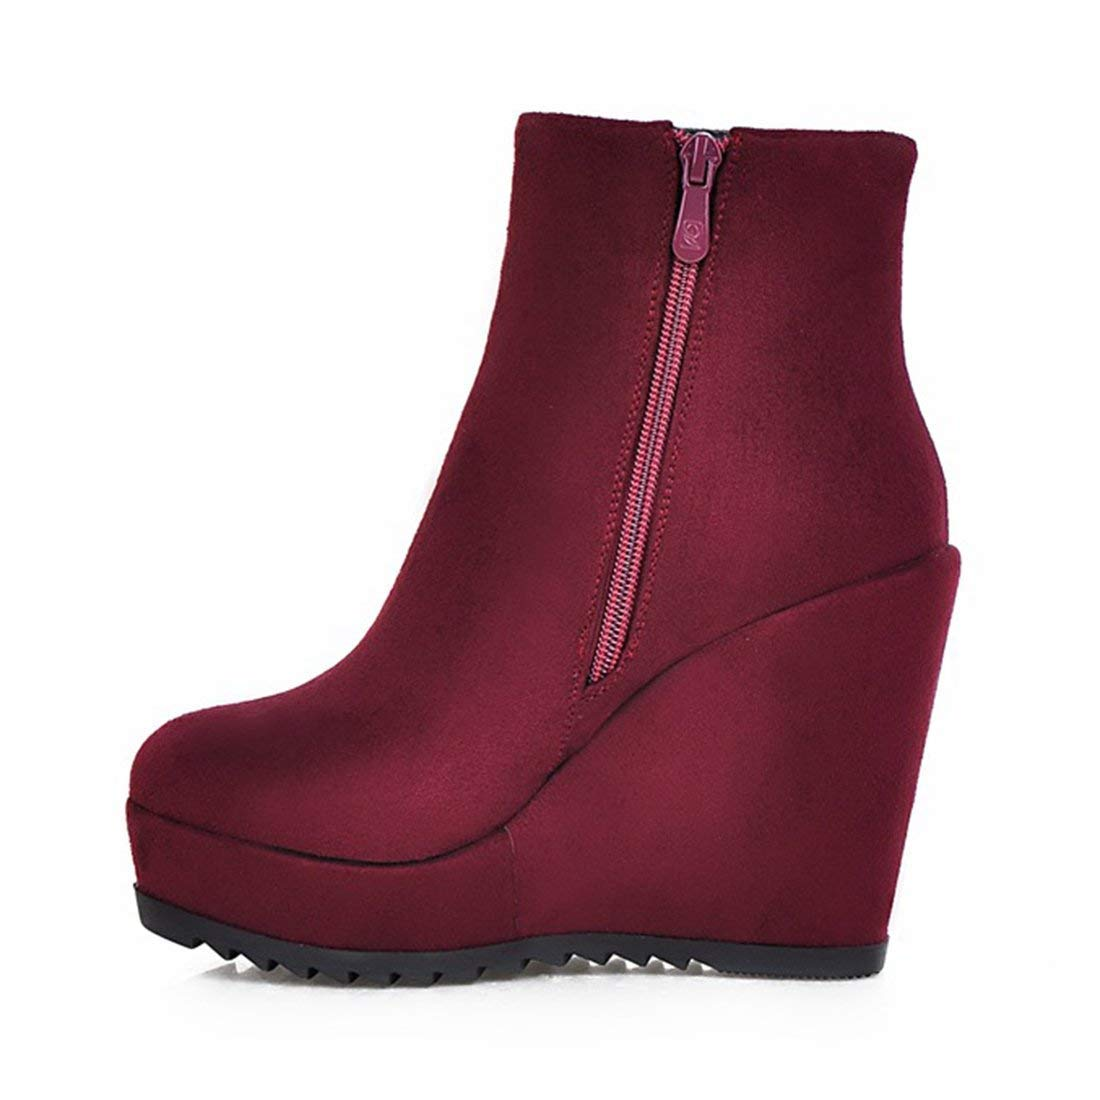 178dbf3e77c9 Vitalo Womens Wedge Platform Ankle Boots High Heel Zip Up Autumn Winter  Boots  Amazon.ca  Shoes   Handbags